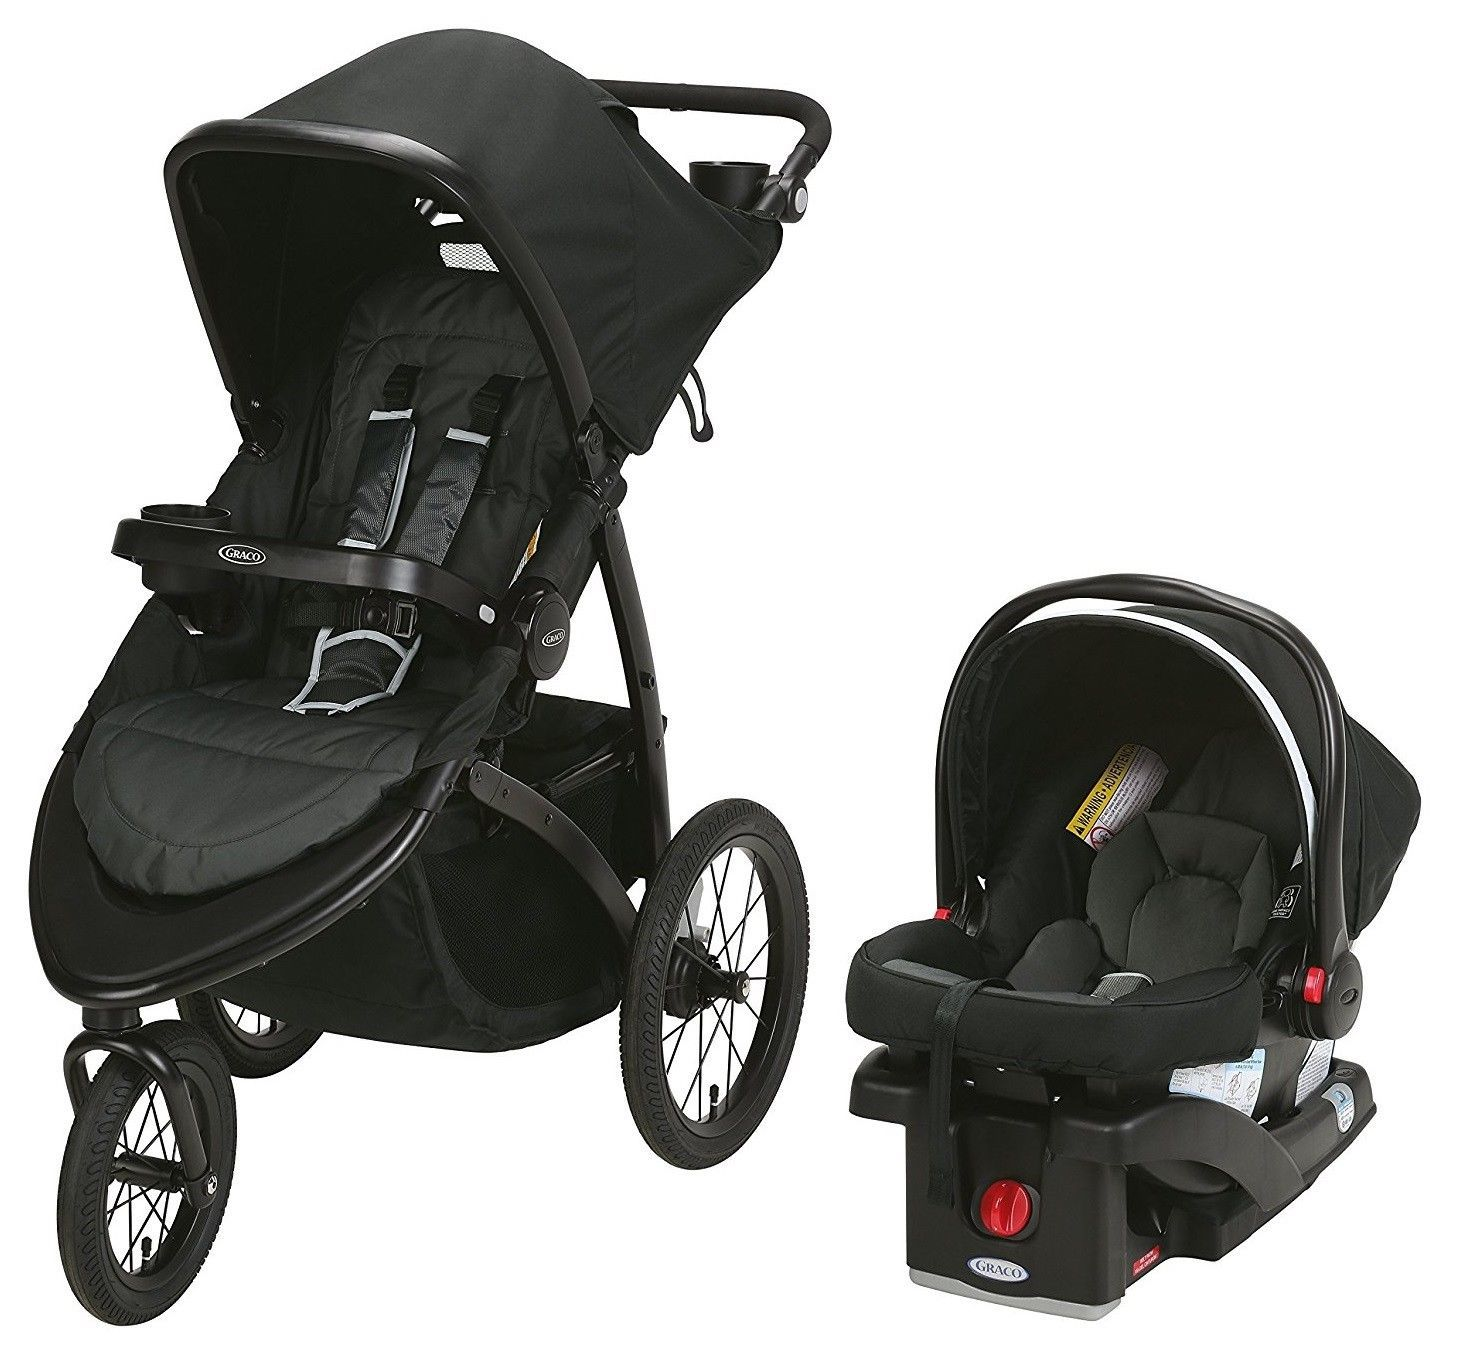 Graco Baby RoadMaster Jogger Travel System Stroller w